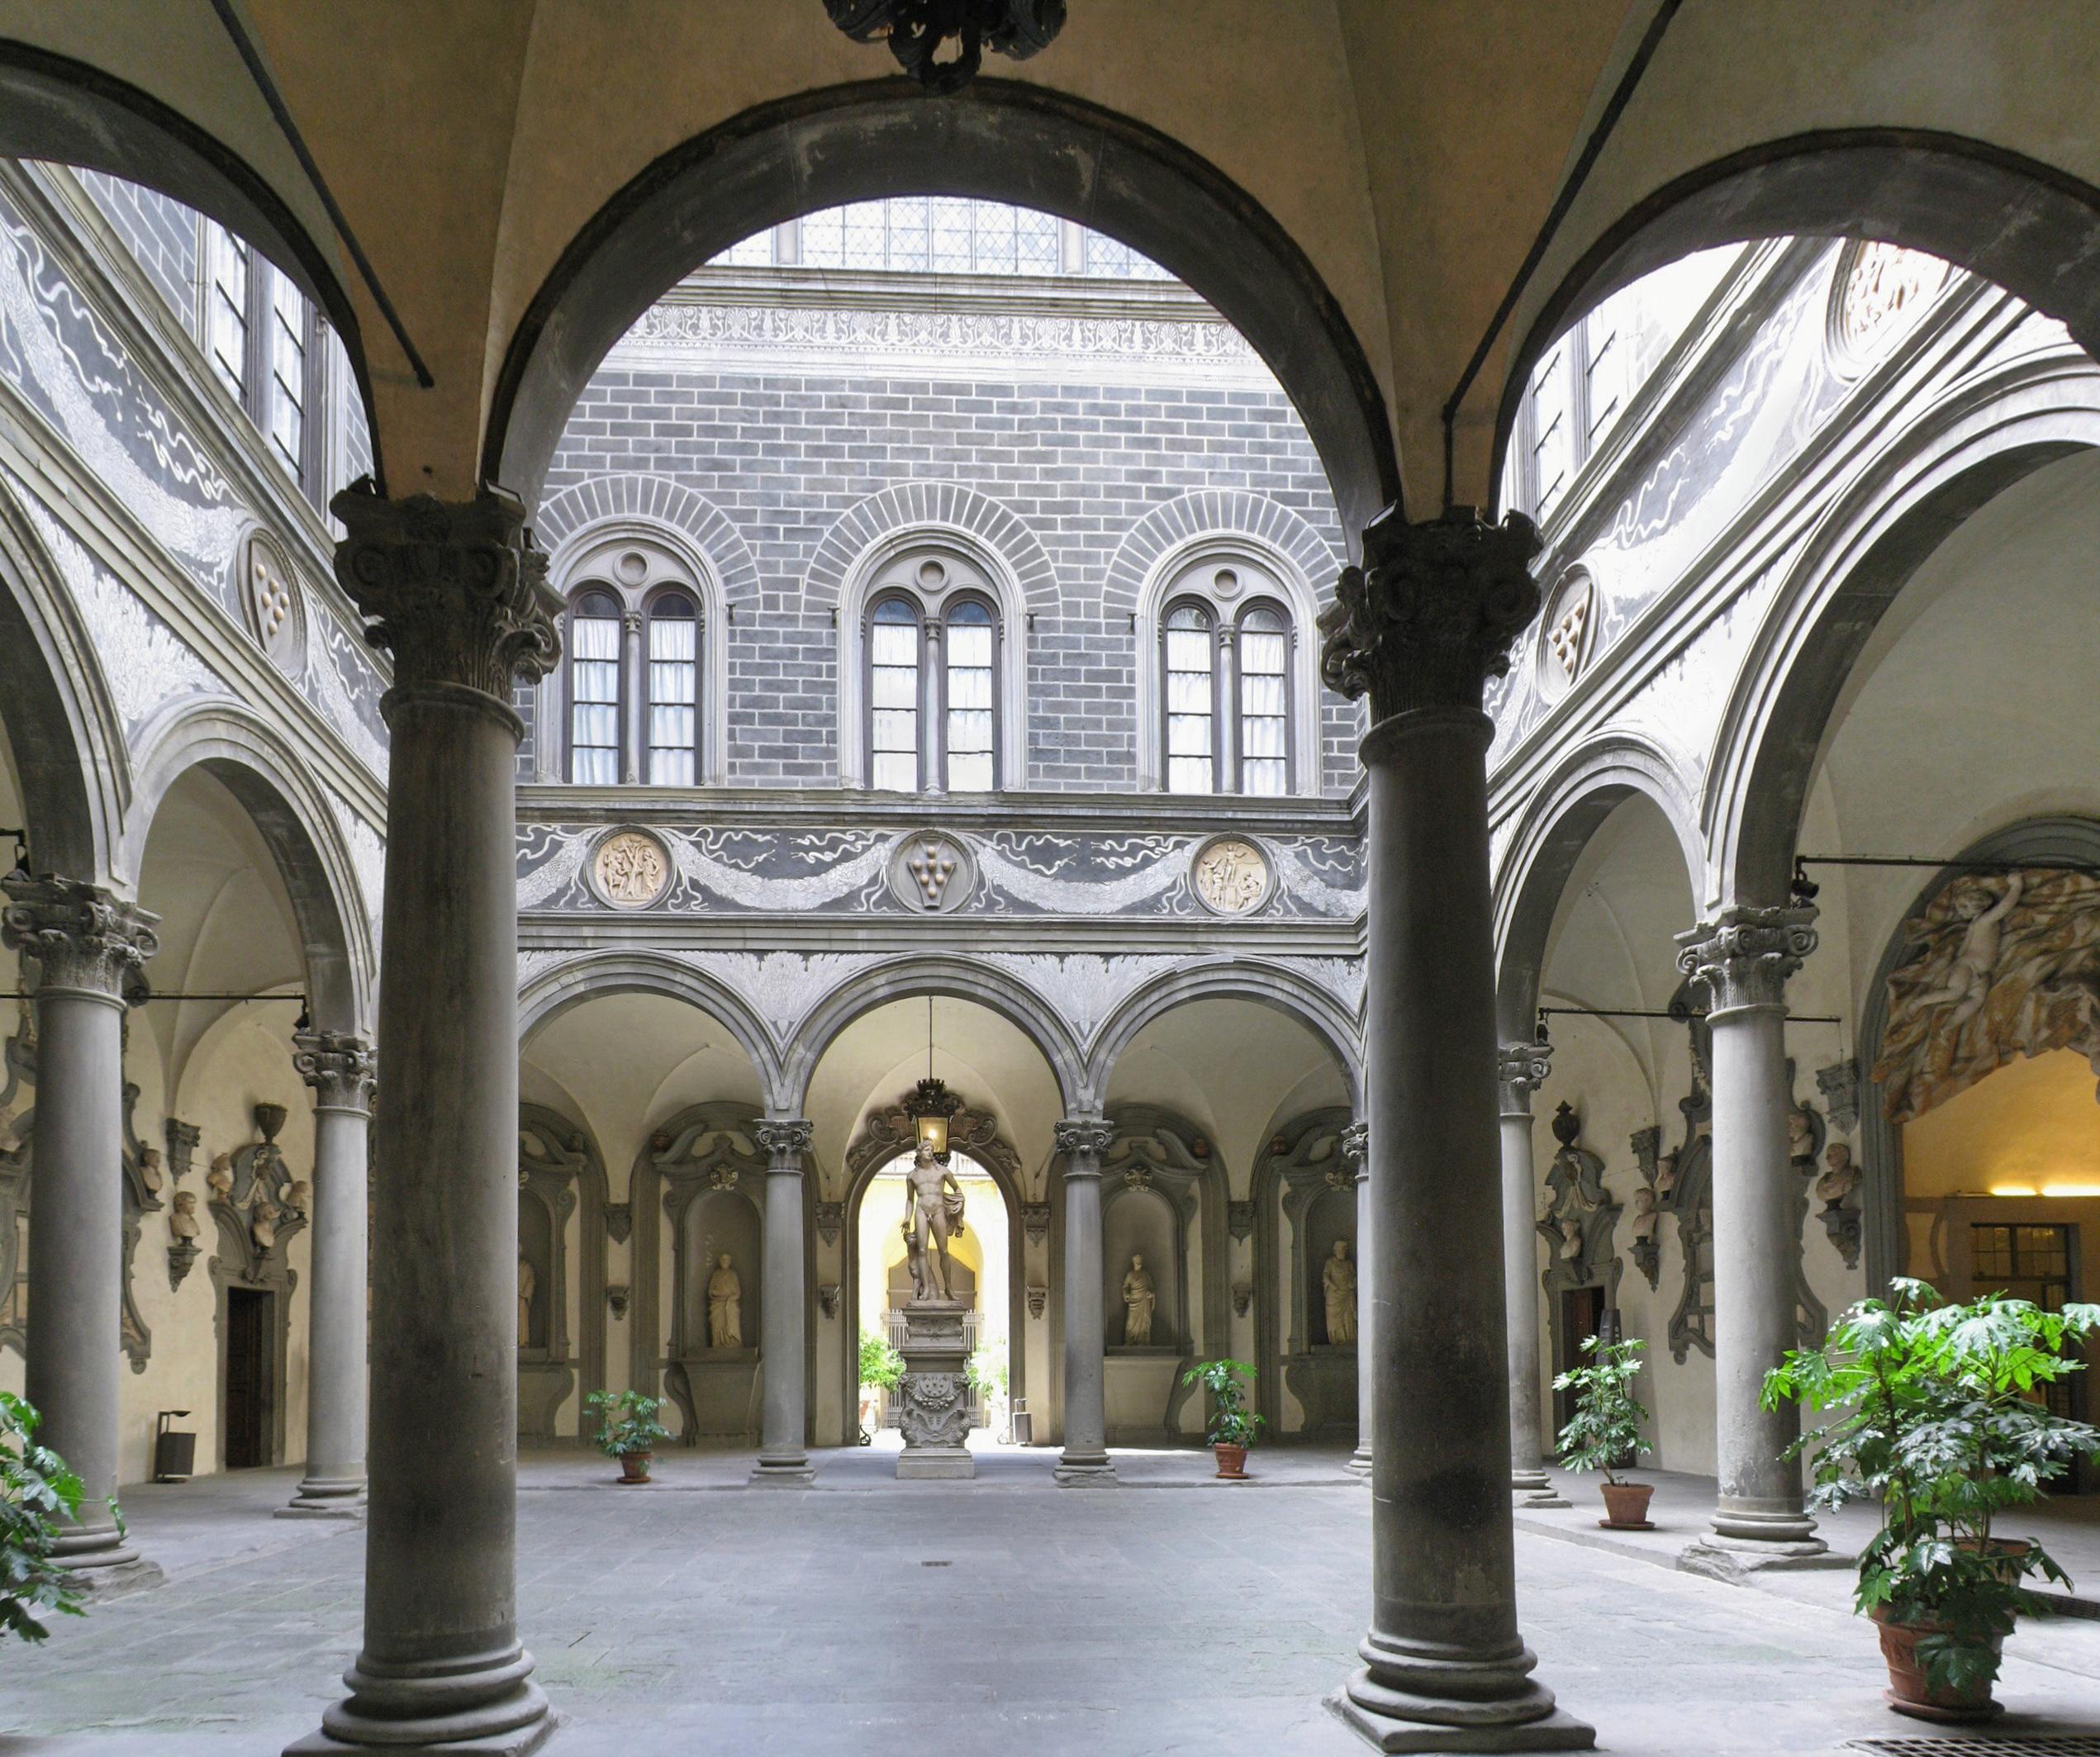 Palazzo_Medici_courtyard_Apr_2008_%2810%29-Palazzo_Medici_courtyard_Apr_2008_%289%29.jpg